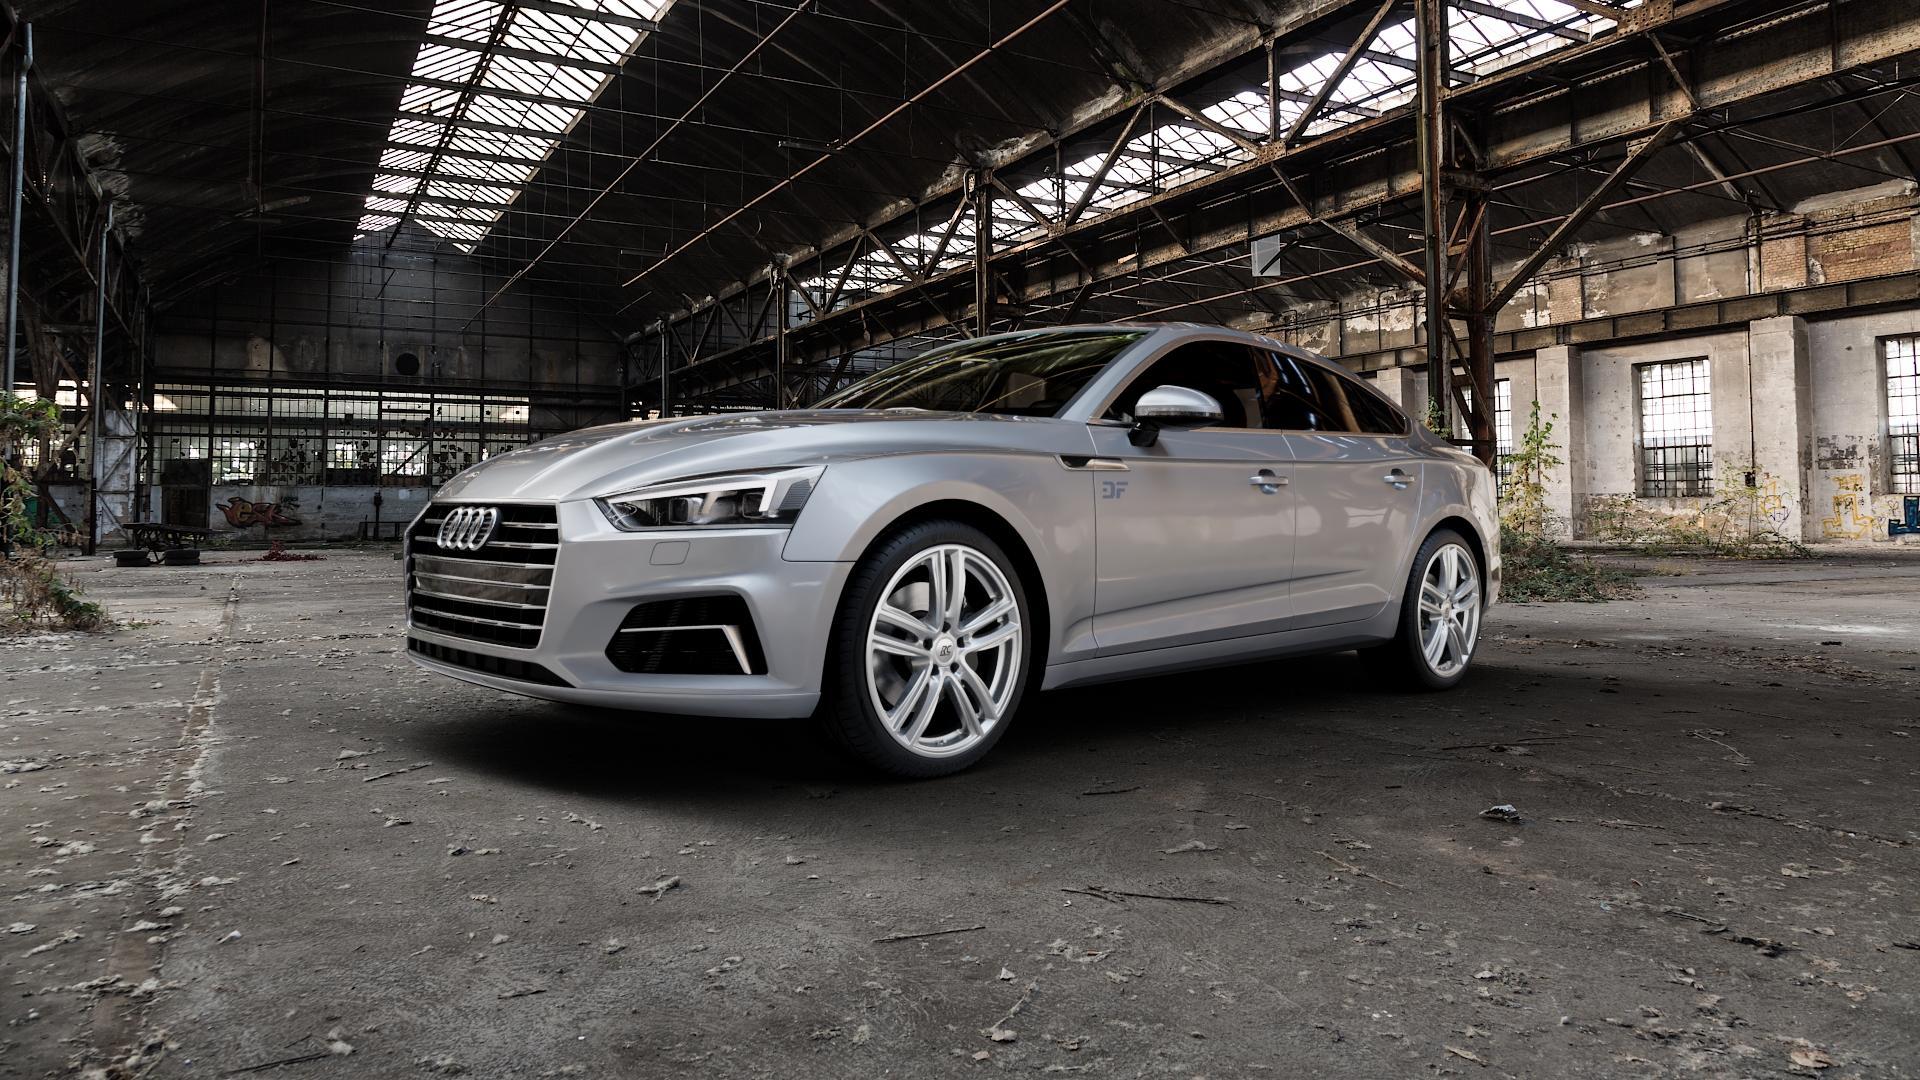 RC Design RC27 kristallsilber lackiert Felge mit Reifen in 19Zoll Winterfelge Alufelge auf silbernem Audi A5 Typ B9 (Sportback) 2,0l TDI 140kW (190 PS) quattro TFSI 185kW (252 3,0l 160kW (218 200kW (272 1,4l 110kW (150 183kW (249 g-tron 125kW (170 Mild-Hybrid 100kW (136 210kW (286 45 180kW (245 35 40 50 170kW (231 120kW (163 30 ⬇️ mit 15mm